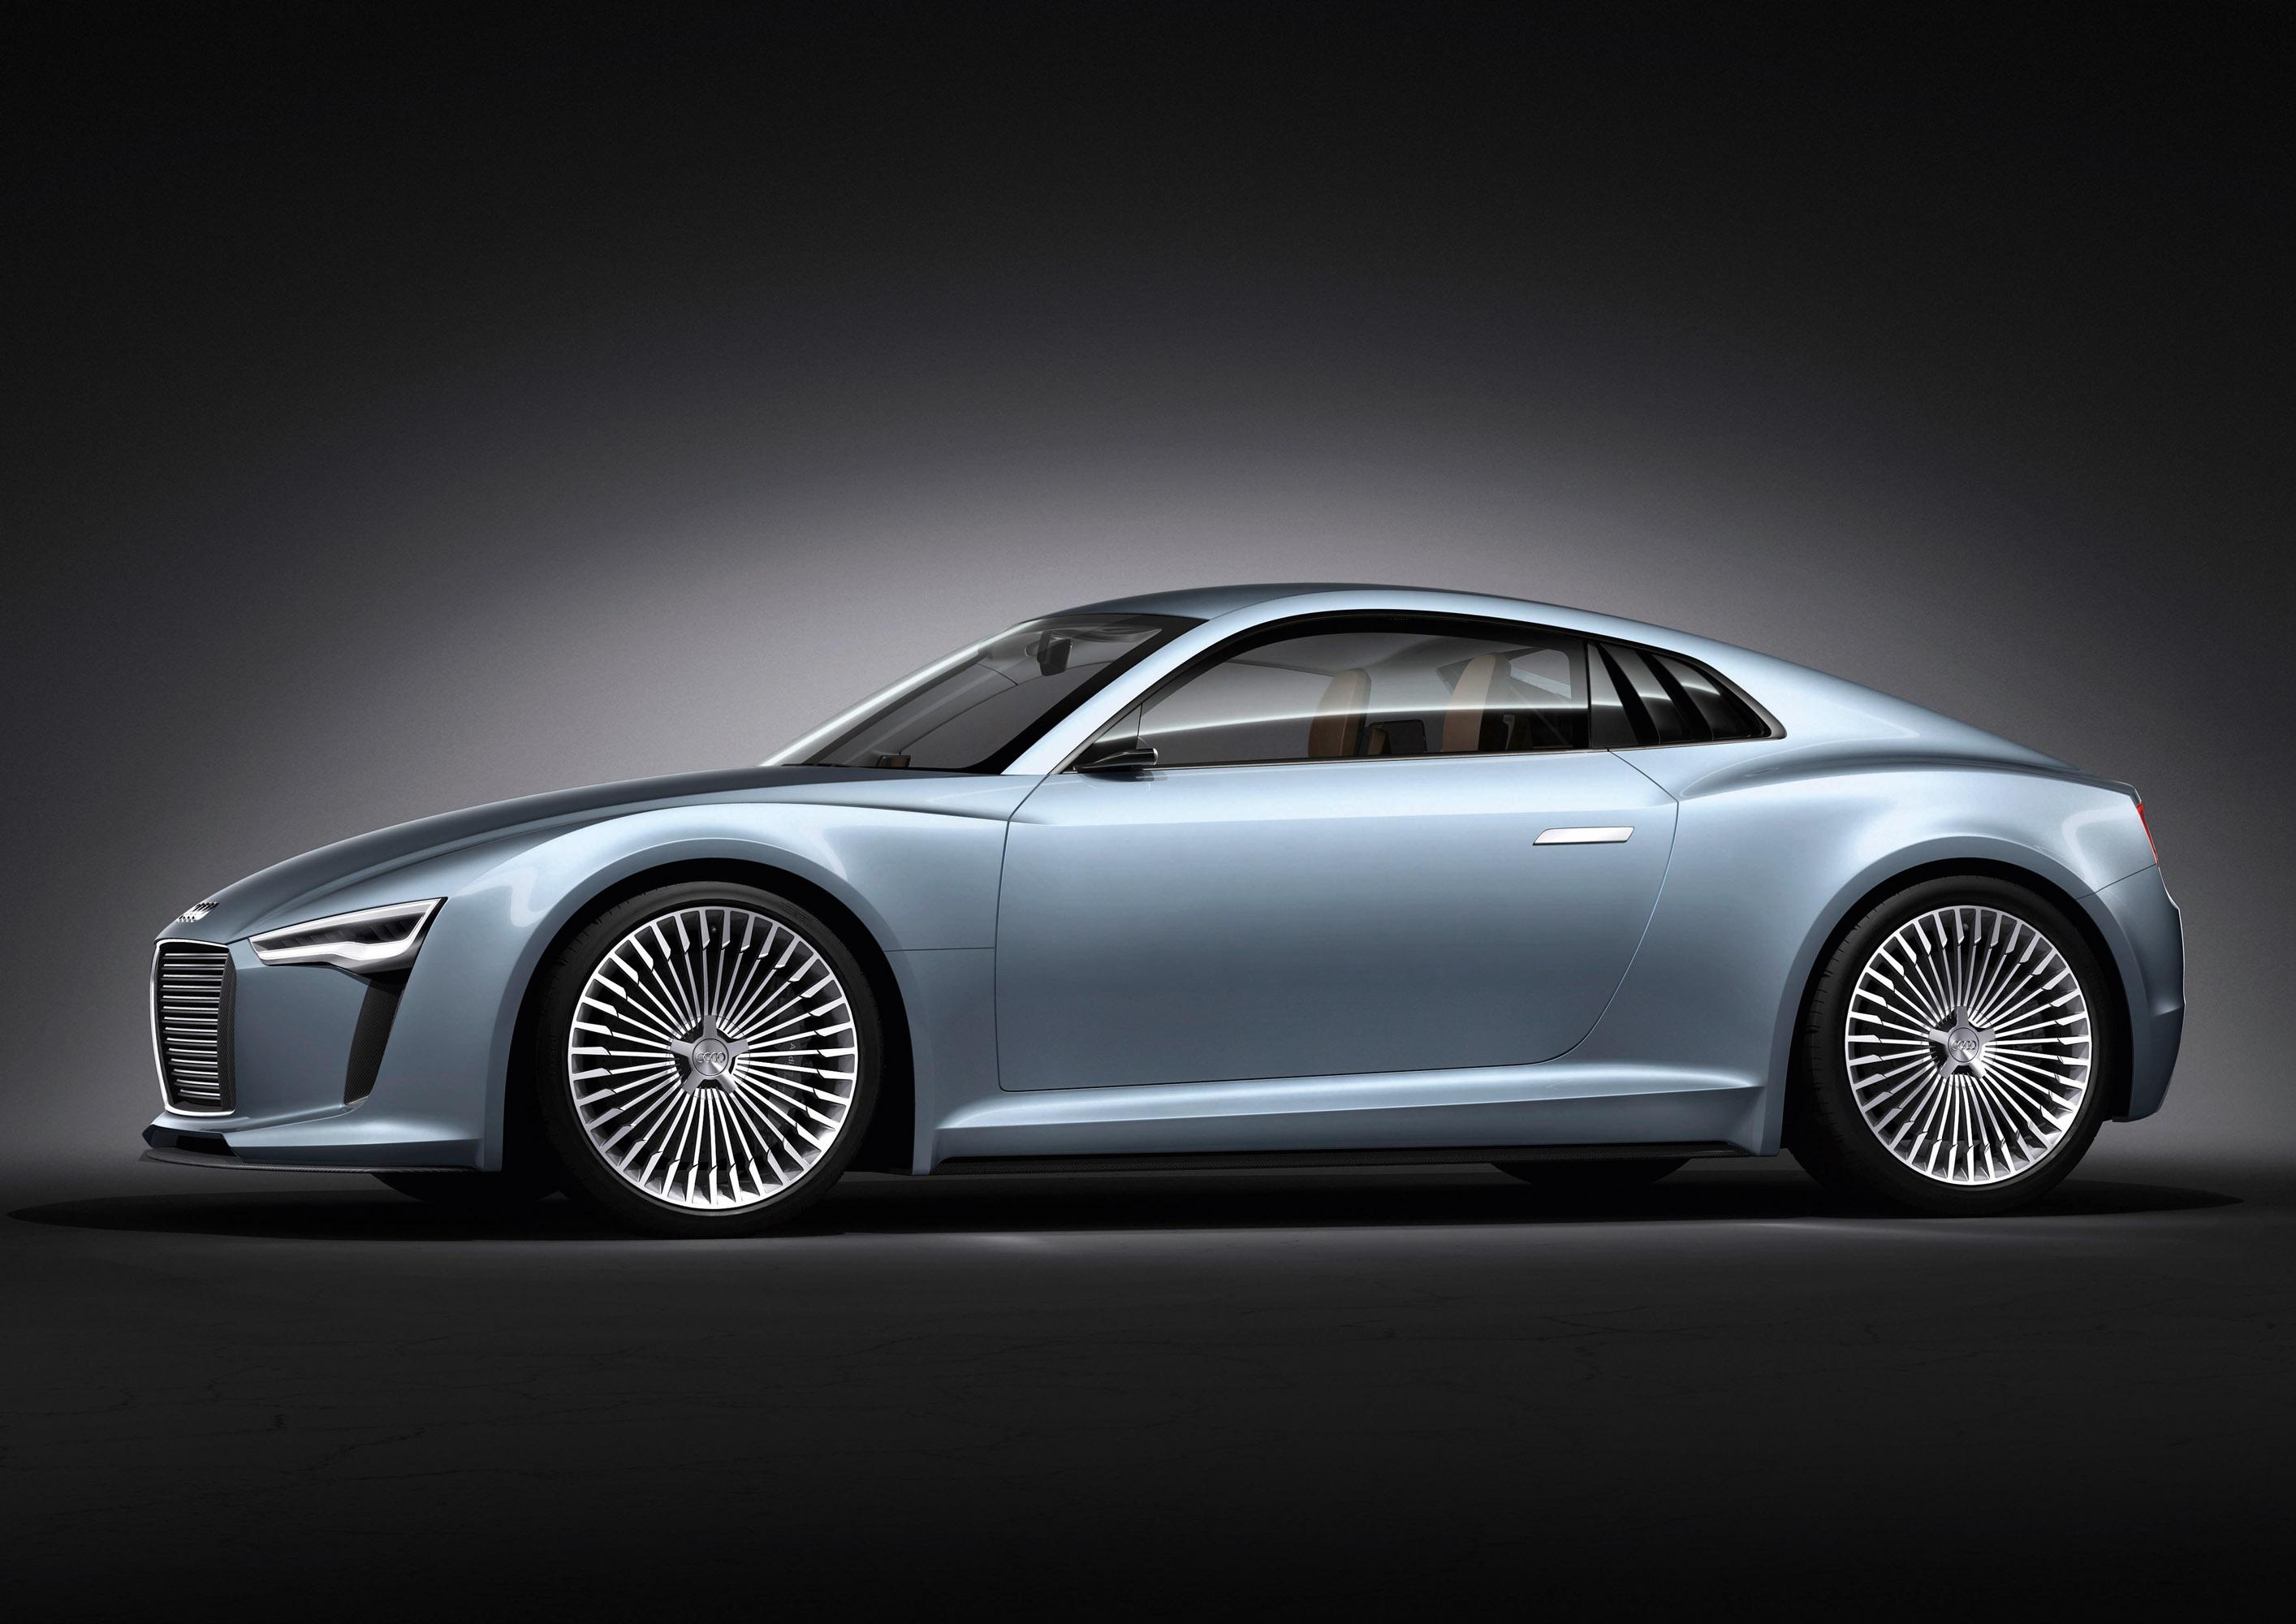 2010 Audi e-tron Detroit Showcar Mercedes-Benz presents a C 350 ...